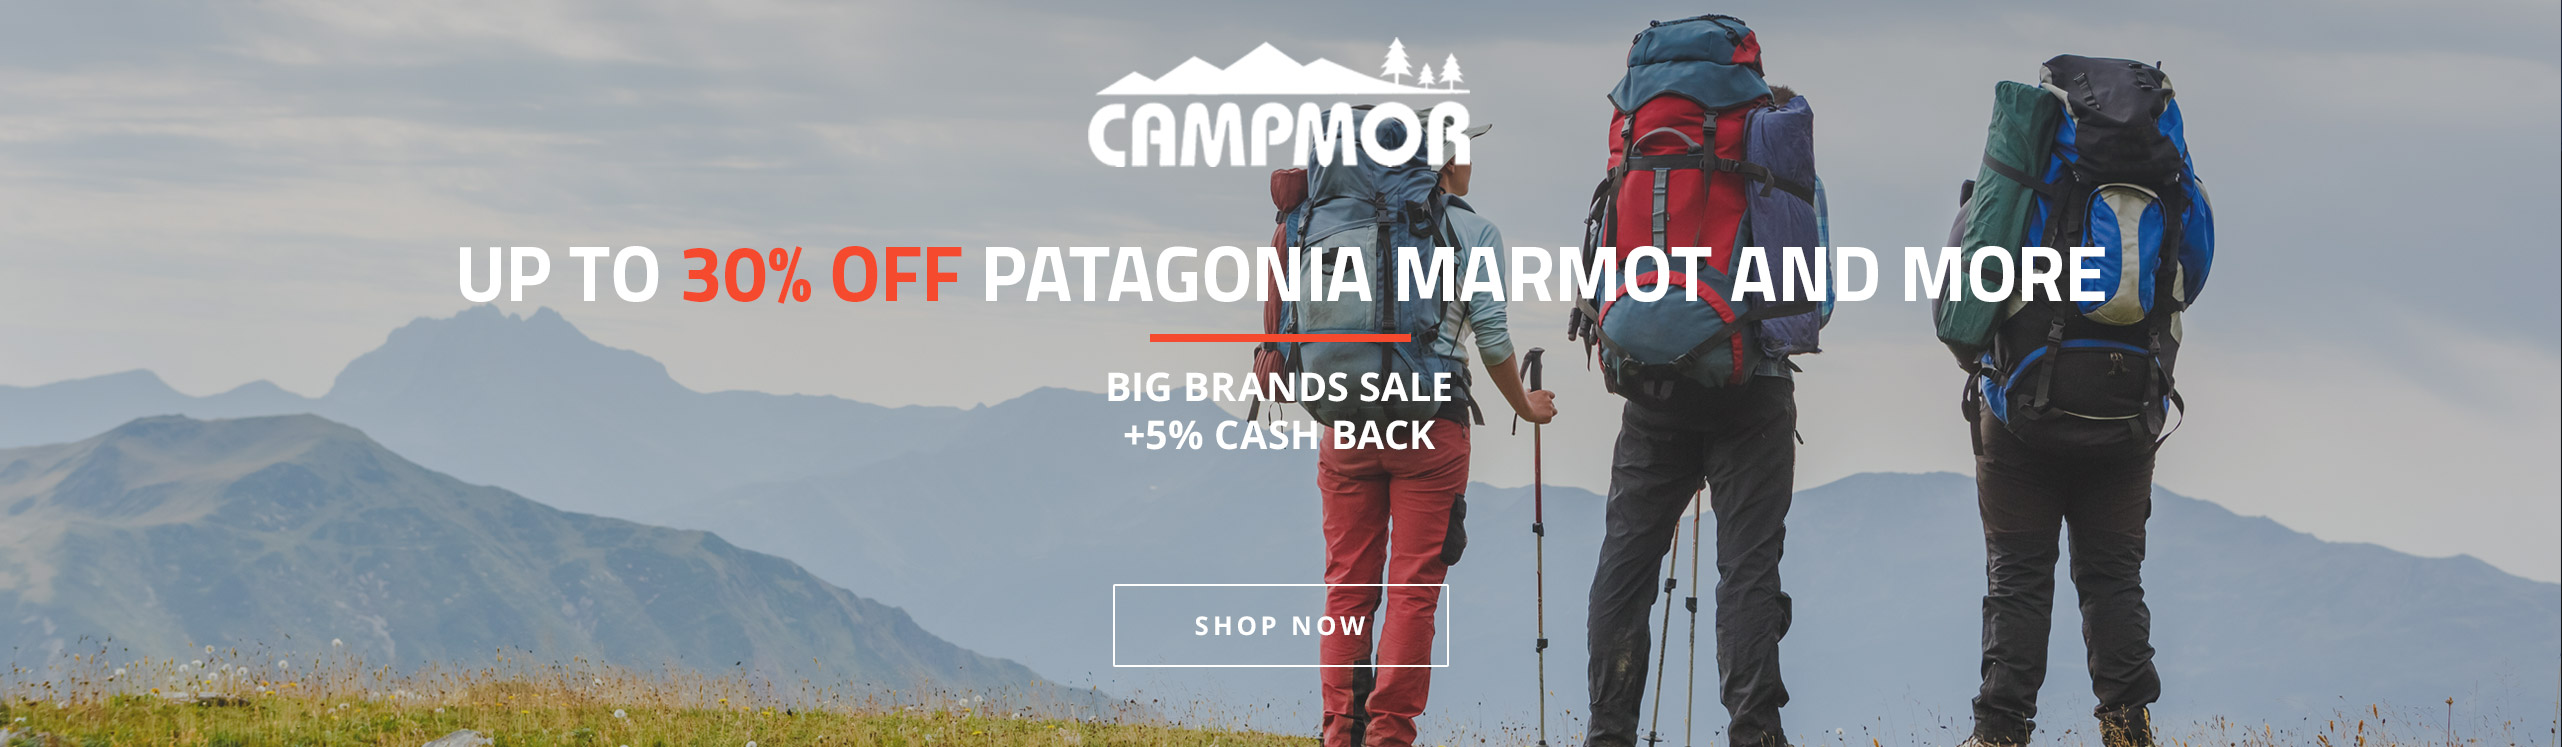 Campmor Big Brands